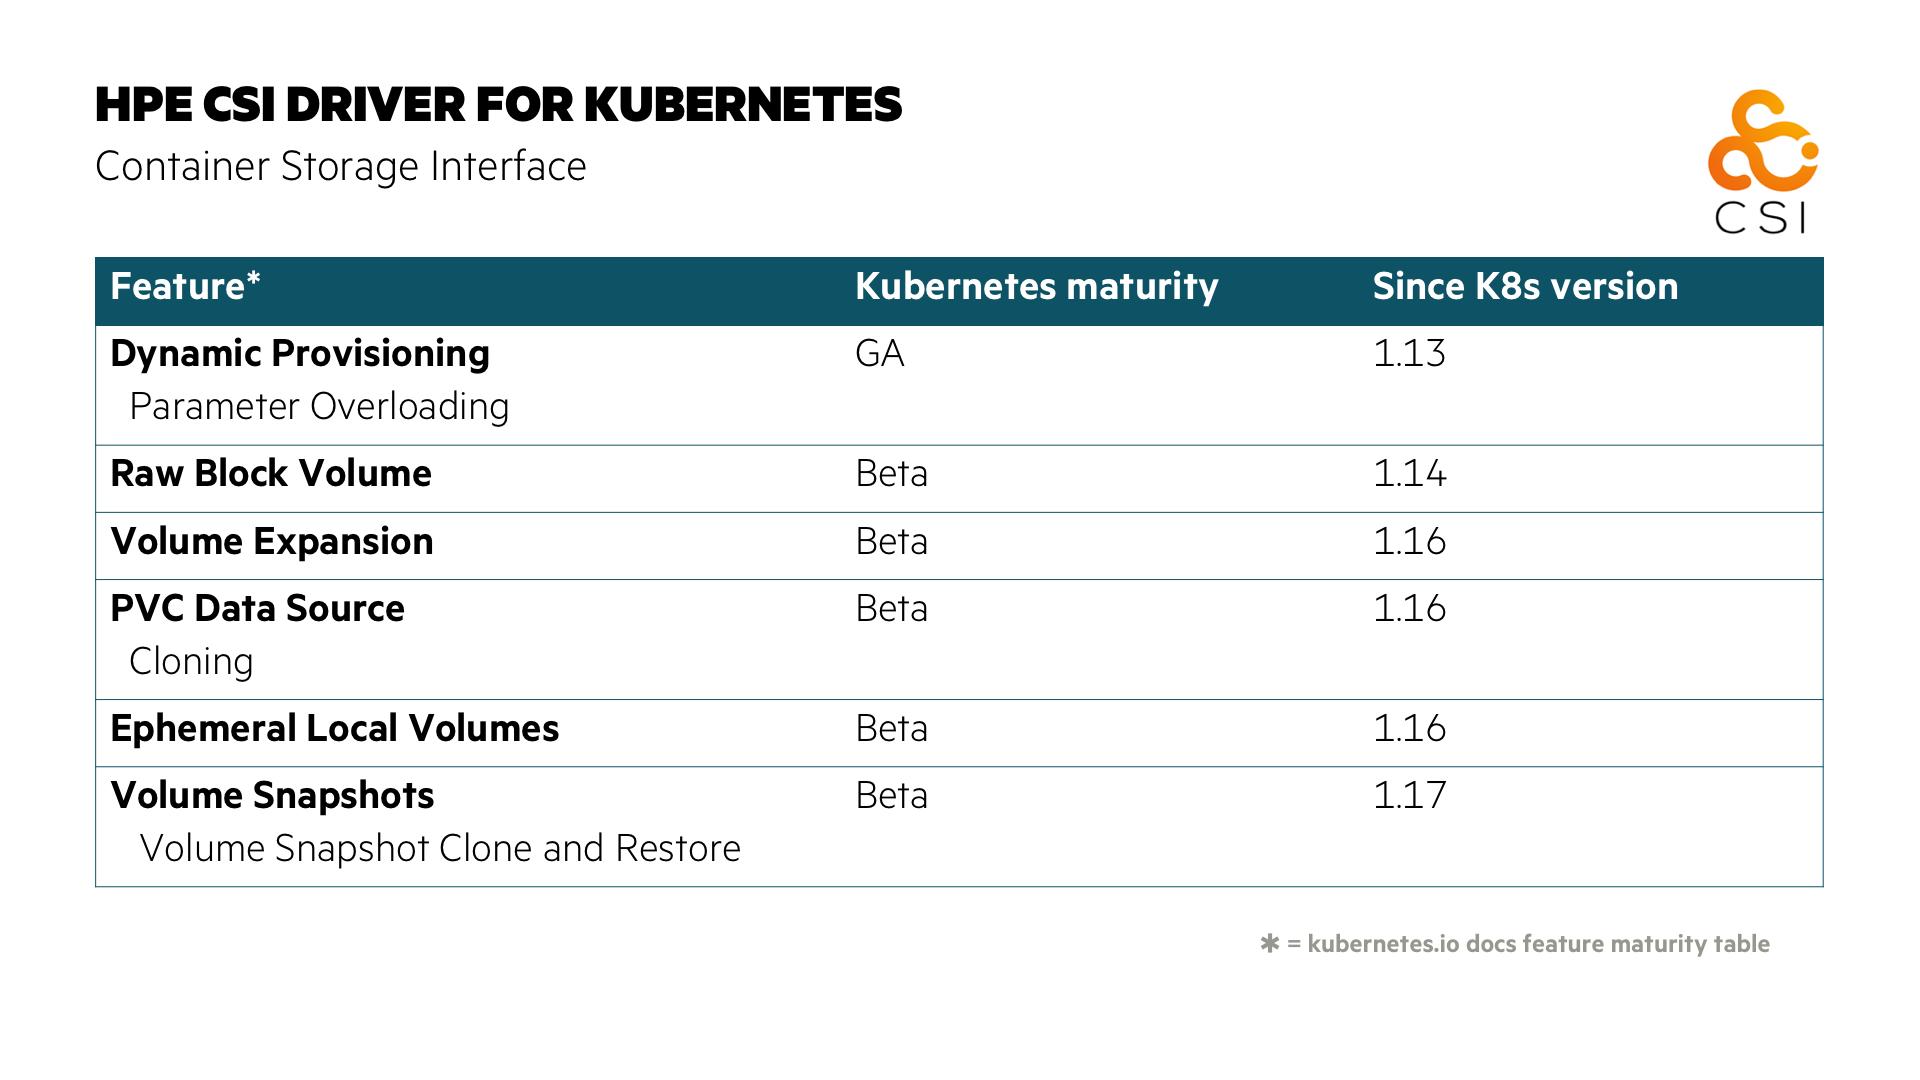 CSI specification maturity table